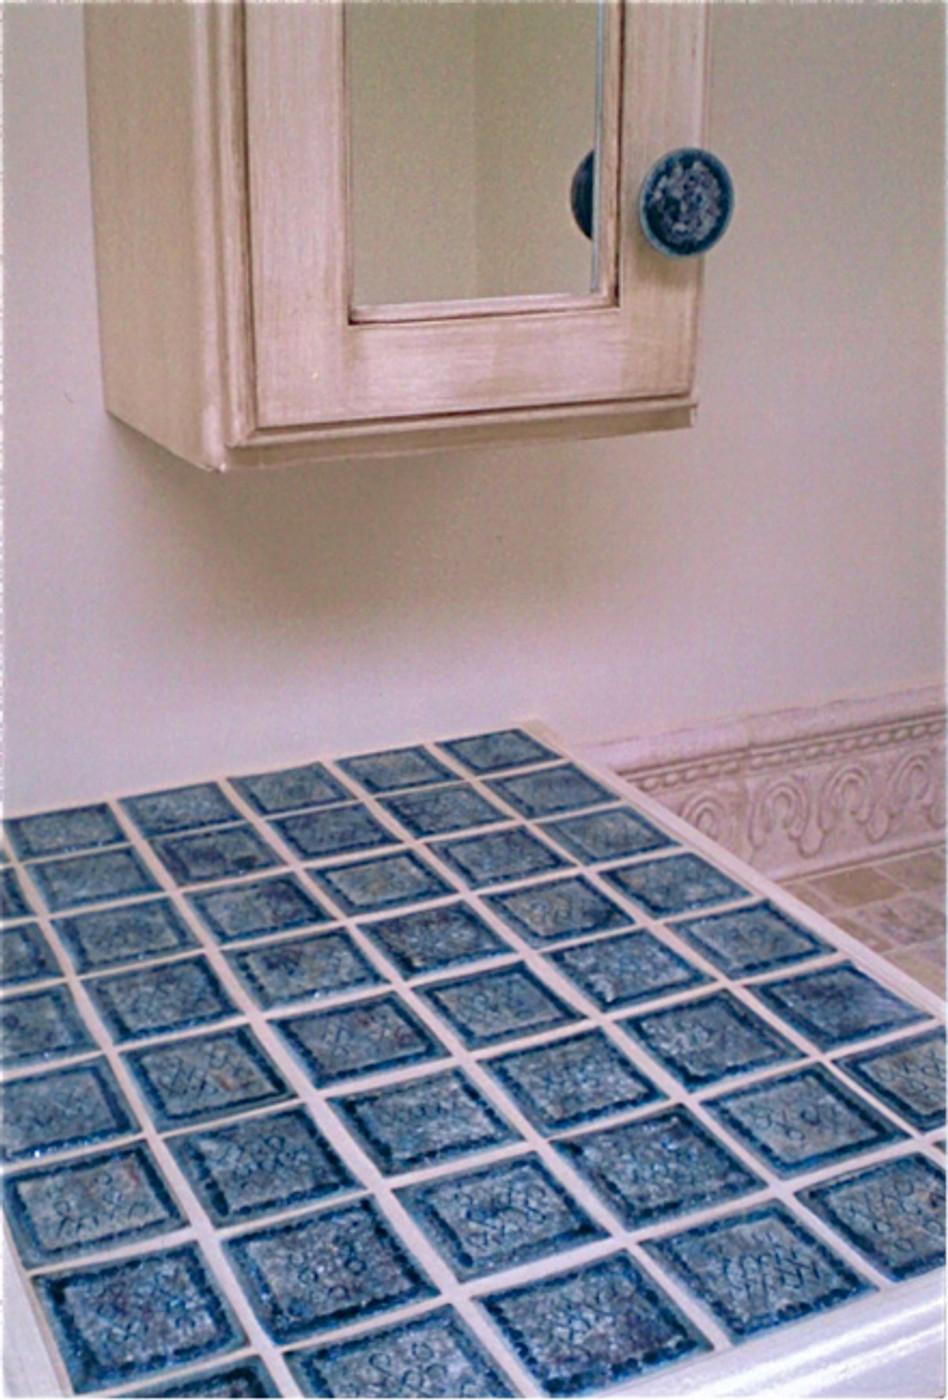 Bathroom Vanity Tiles and Pulls